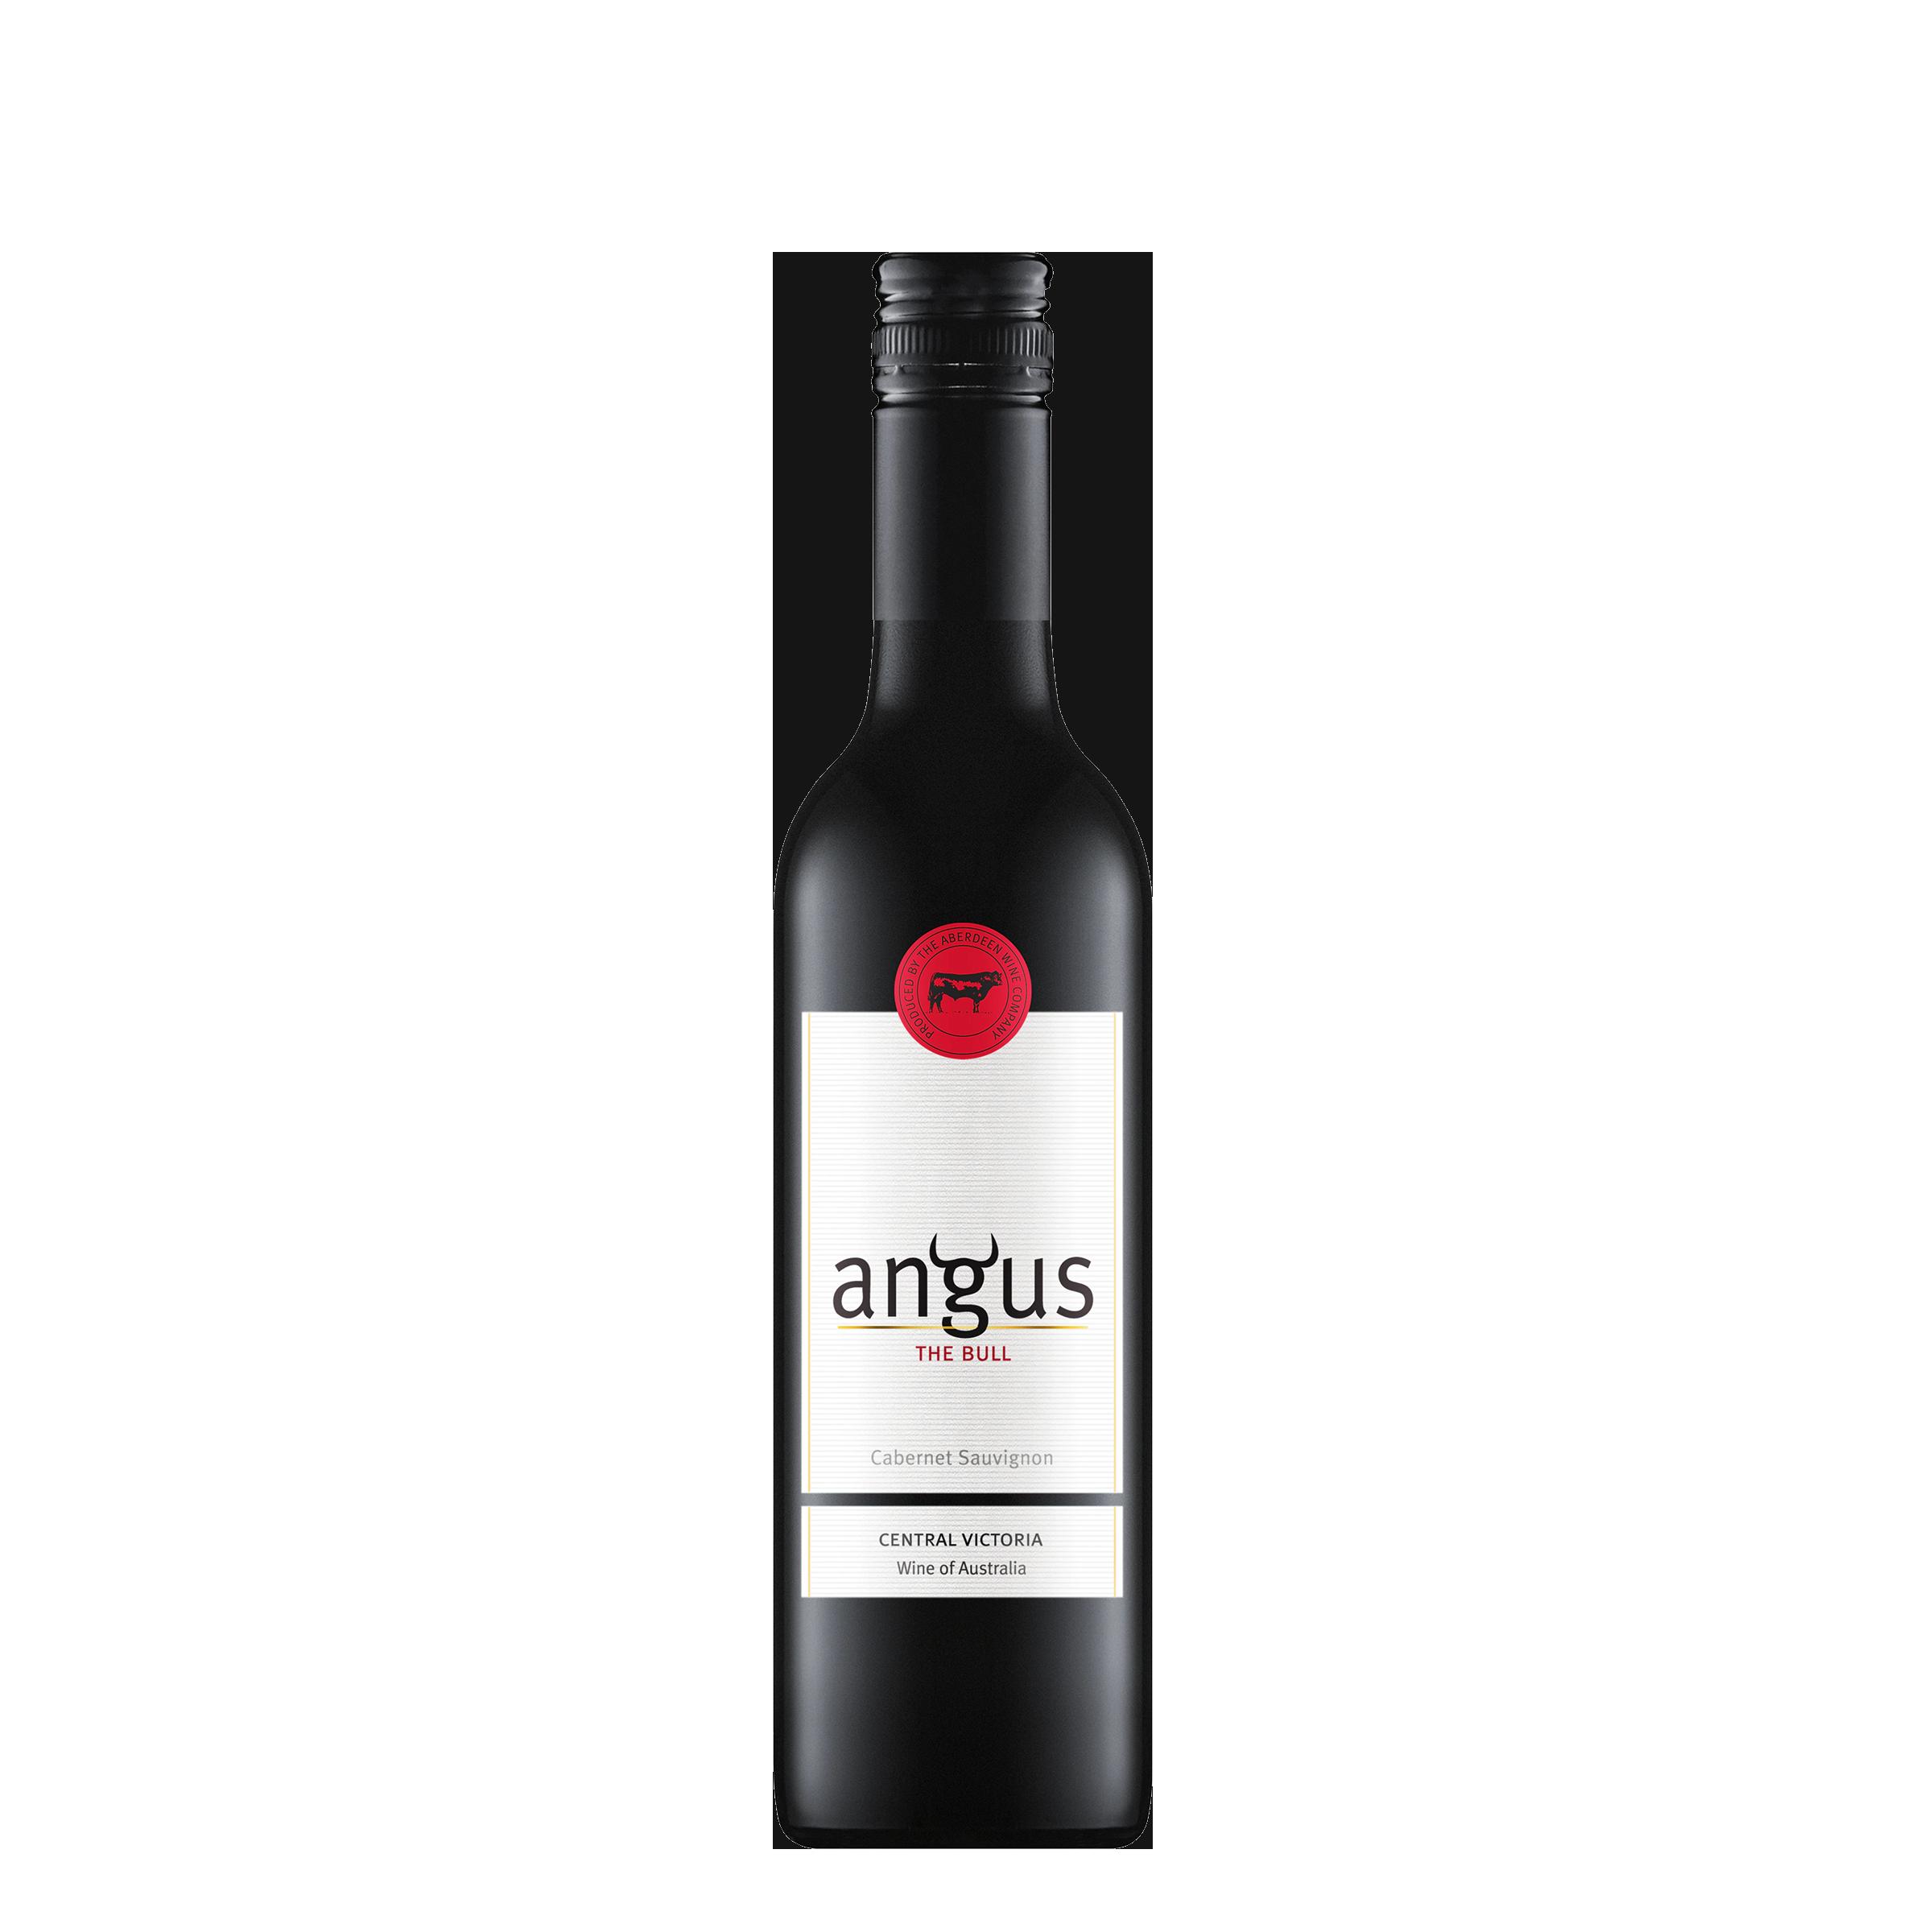 Angus The Bull Cabernet Sauvignon 375mL